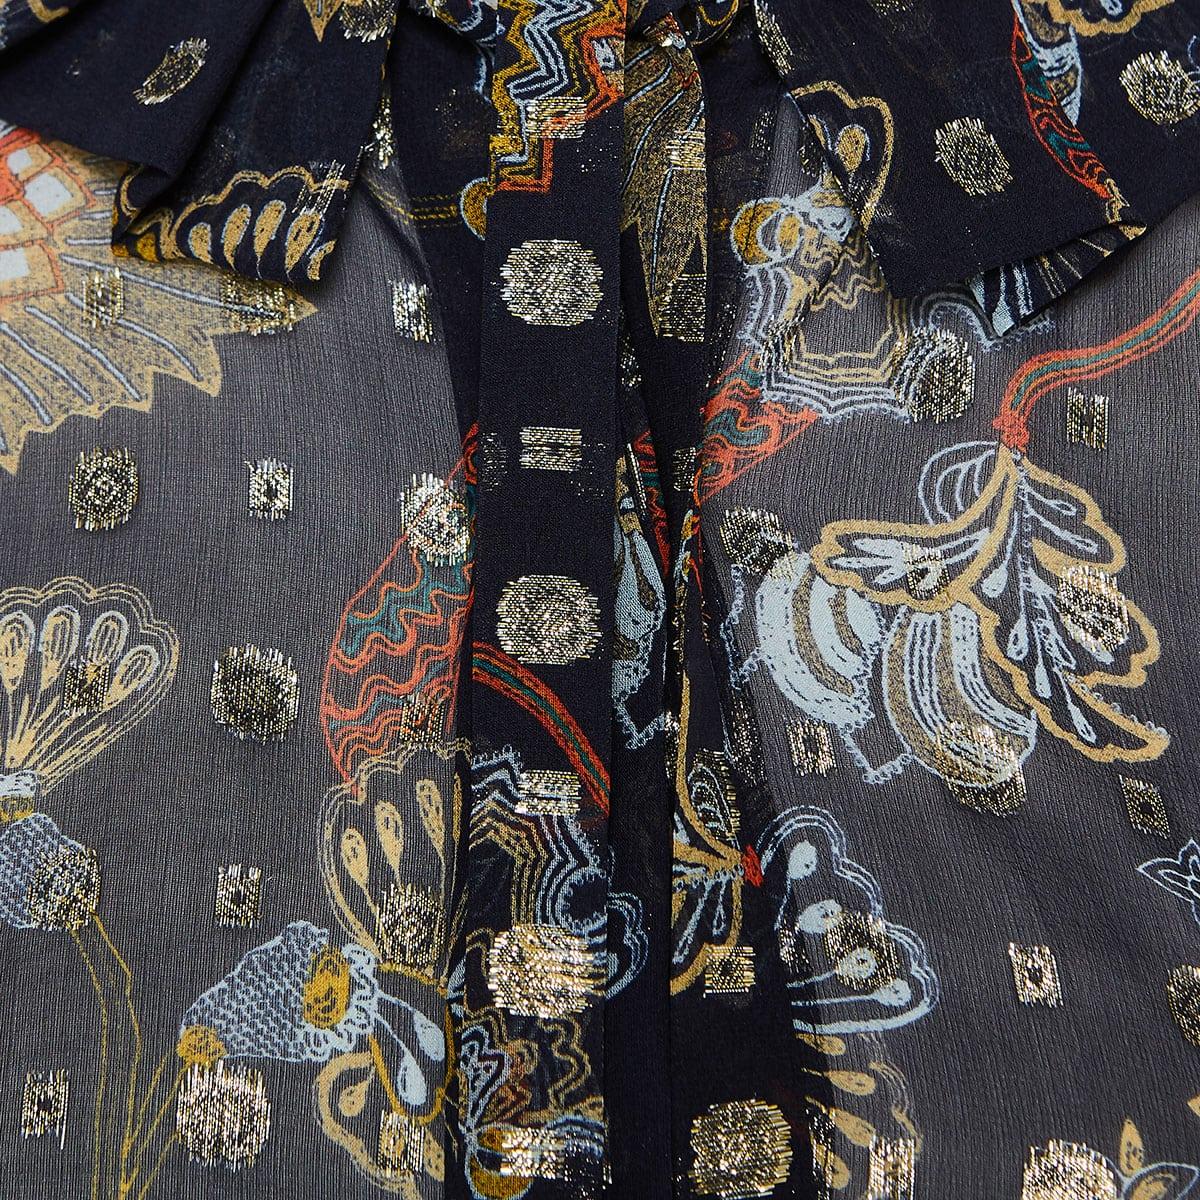 Printed chiffon shirt